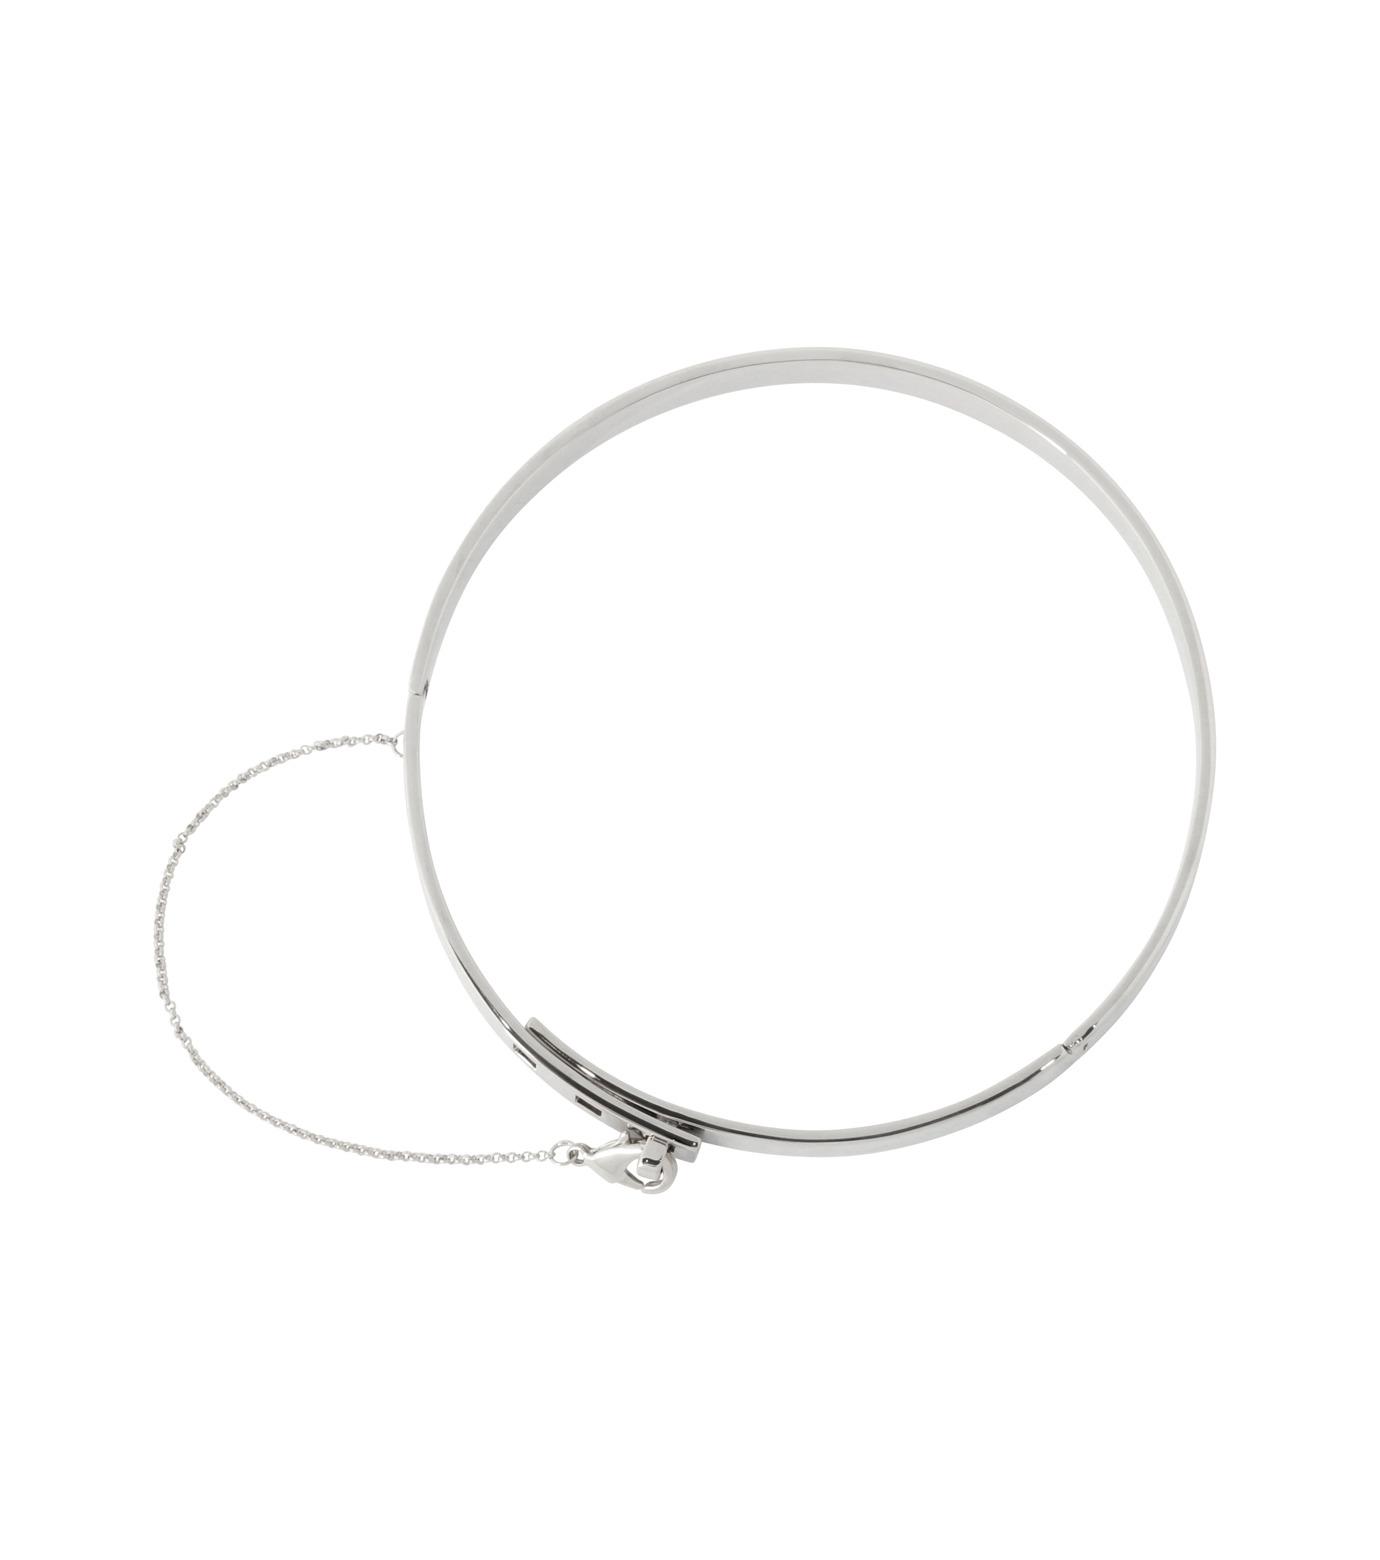 Eddie Borgo(エディ・ボルゴ)のSMALL SAFTY CHAIN CHOKER-SILVER(ネックレス/necklace)-CK1003-R-1 拡大詳細画像3